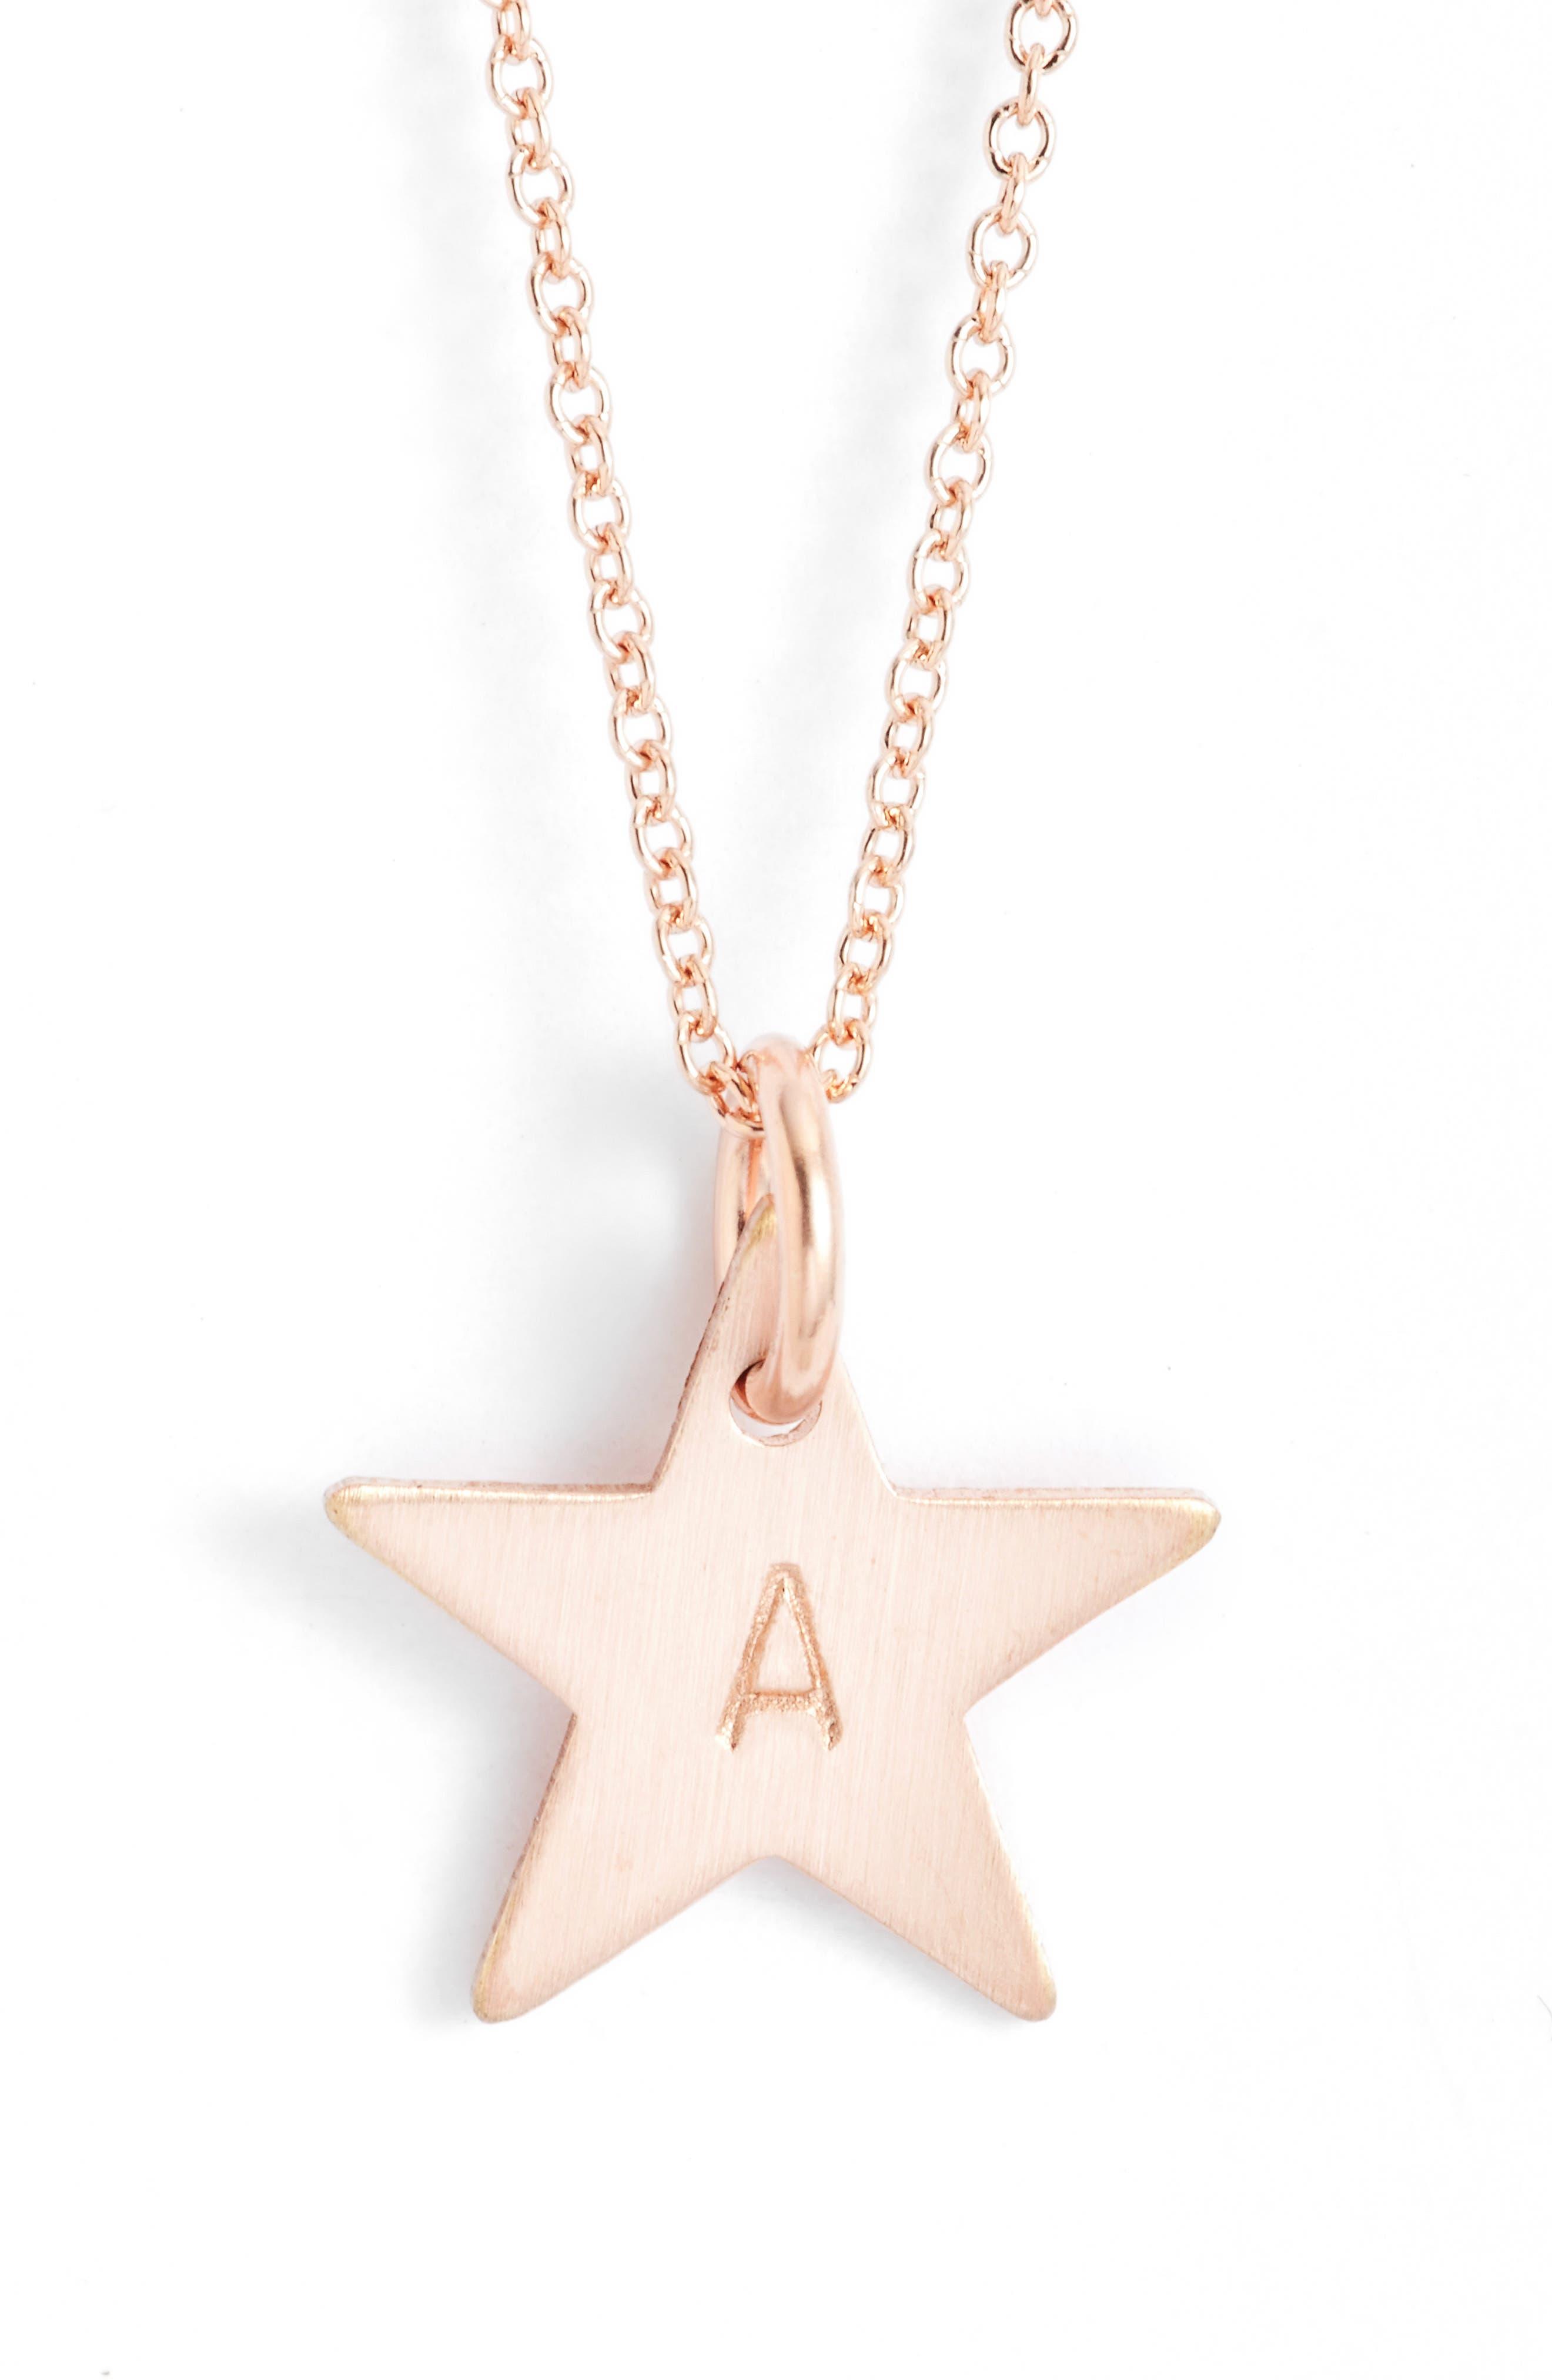 Alternate Image 1 Selected - Nashelle 14k-Rose Gold Fill Initial Mini Star Pendant Necklace